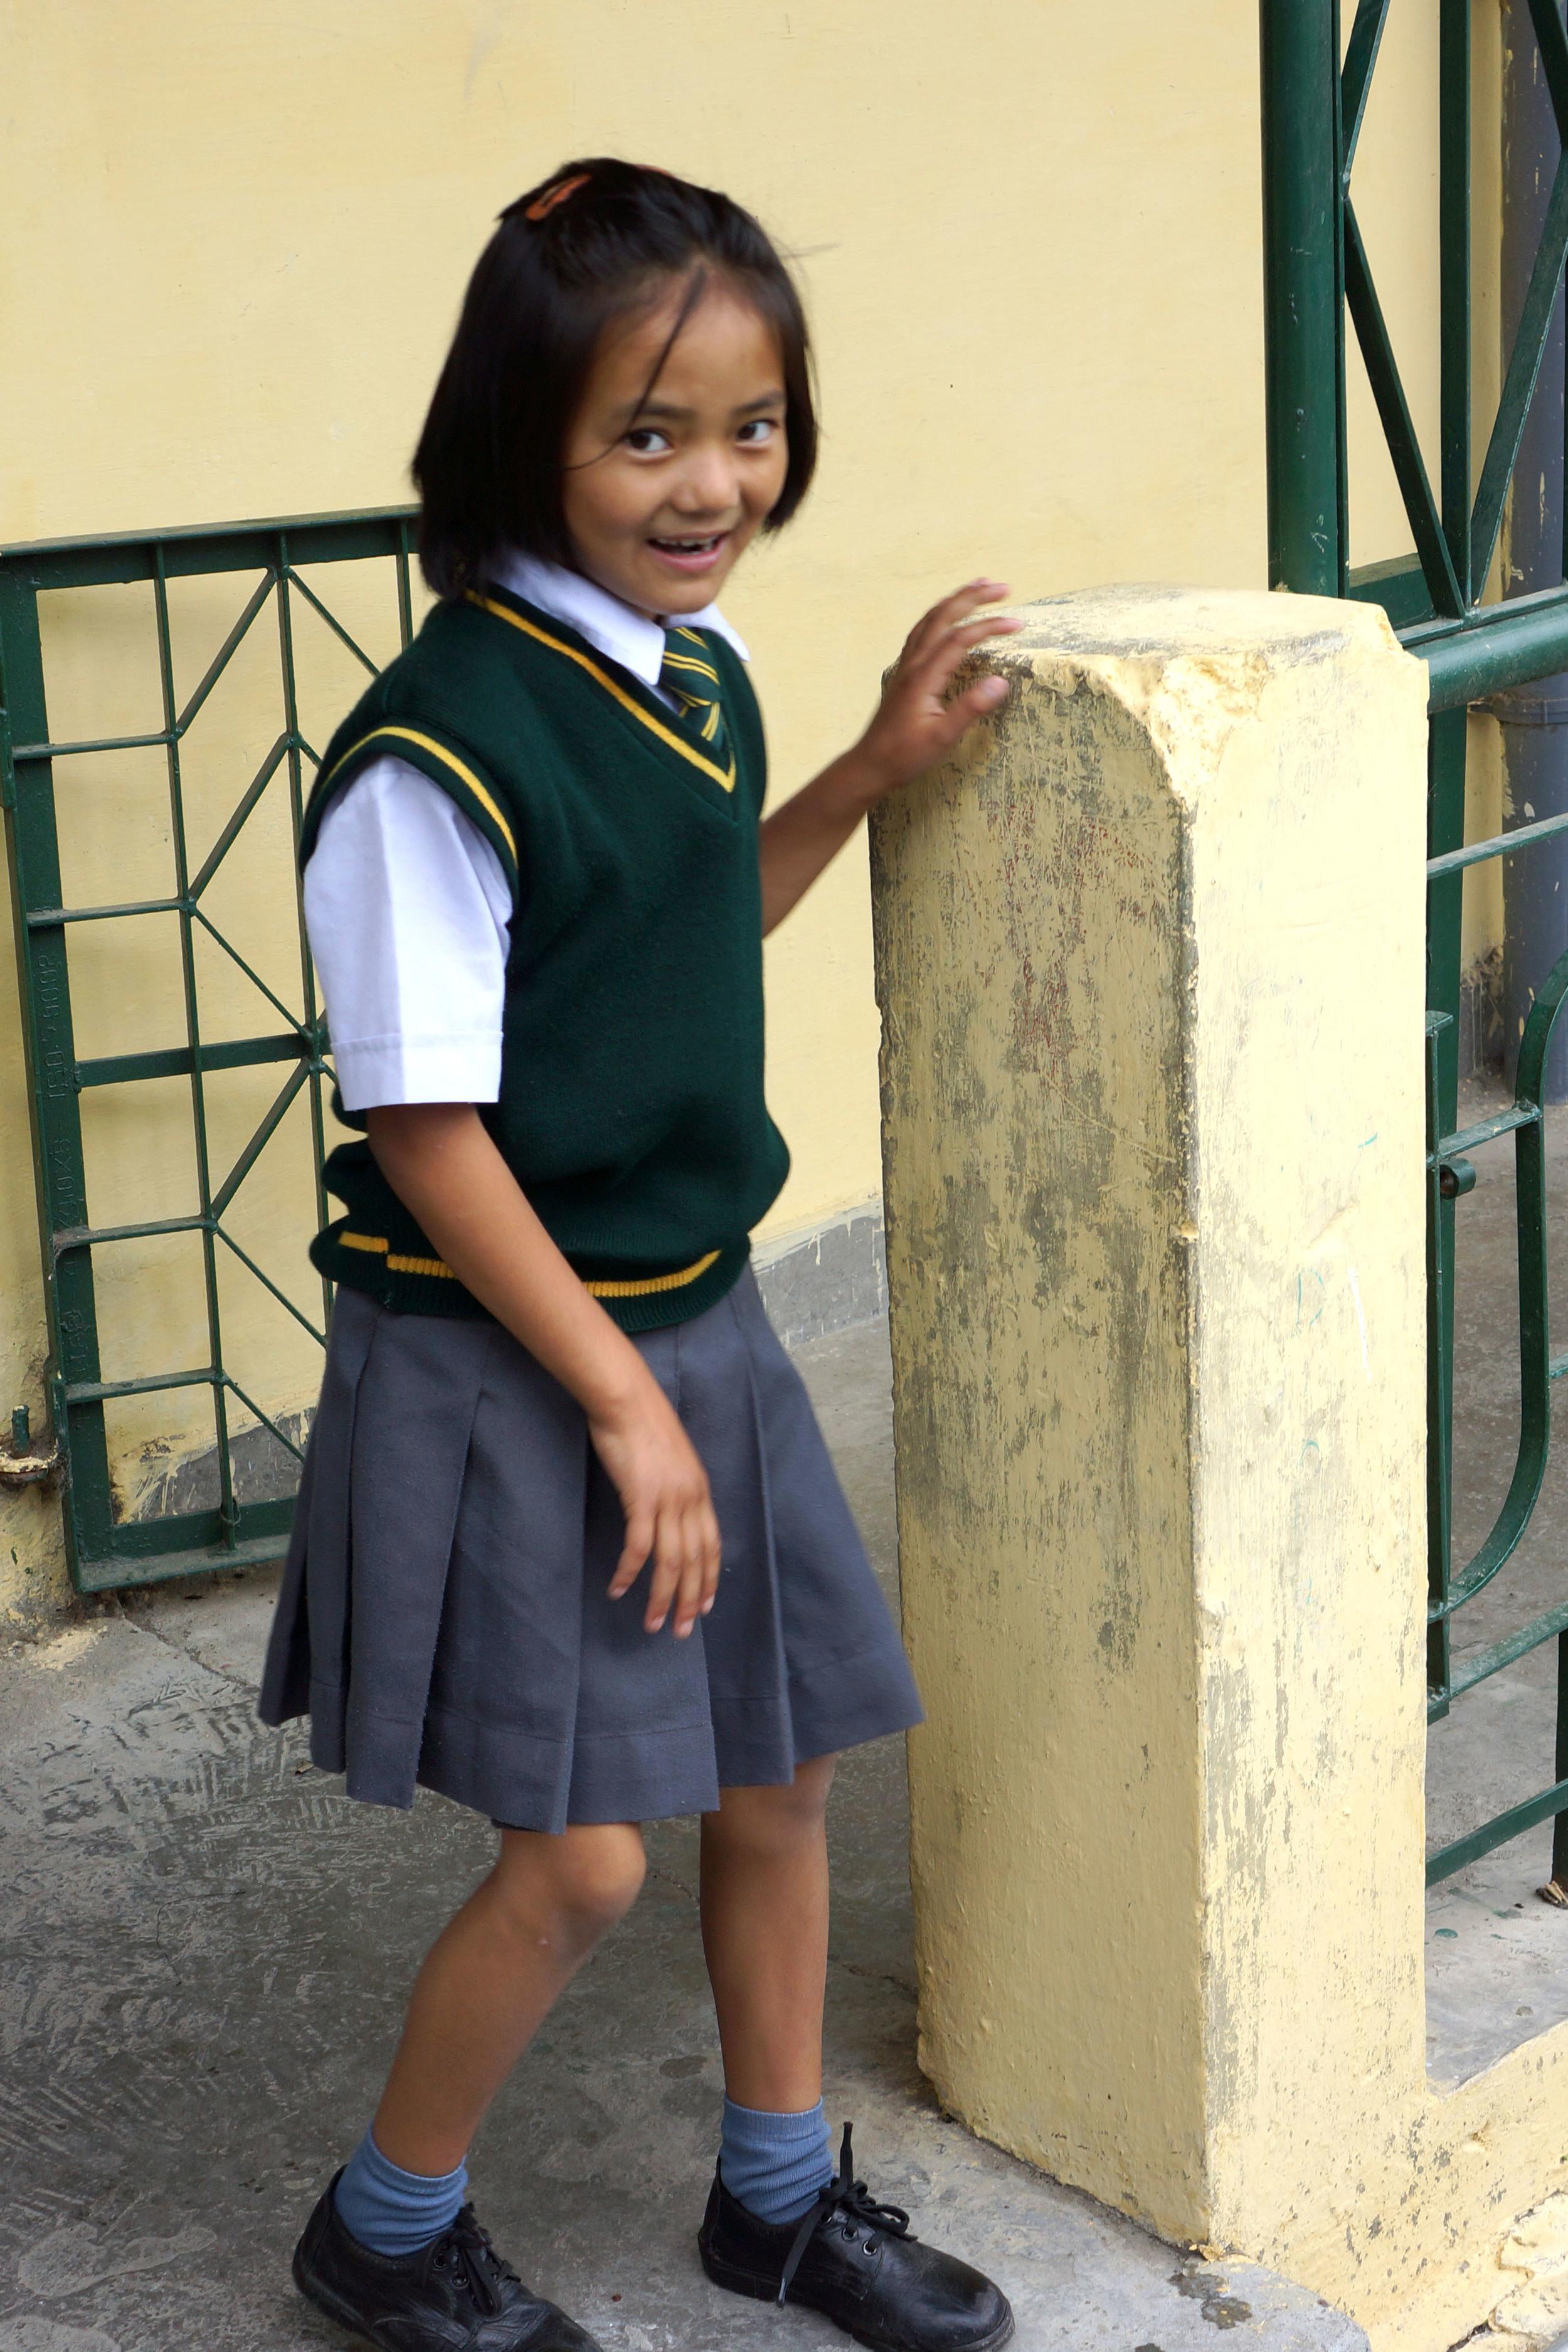 Tibetan girl standing